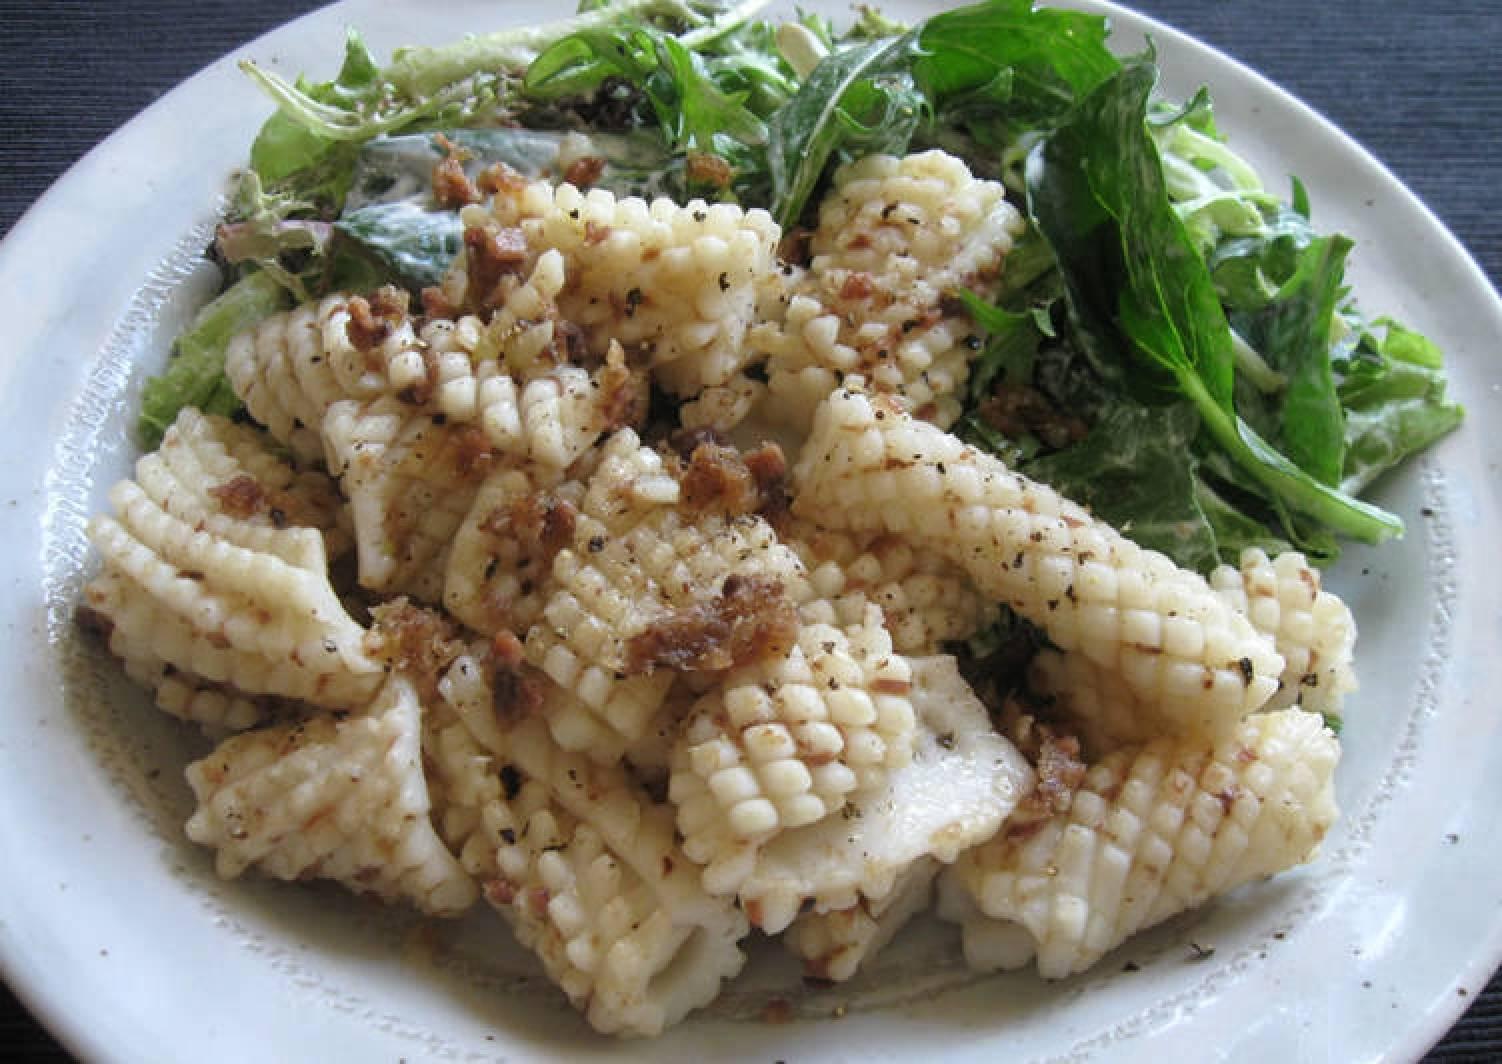 Stir-fried Squid with Garlic & Anchovy